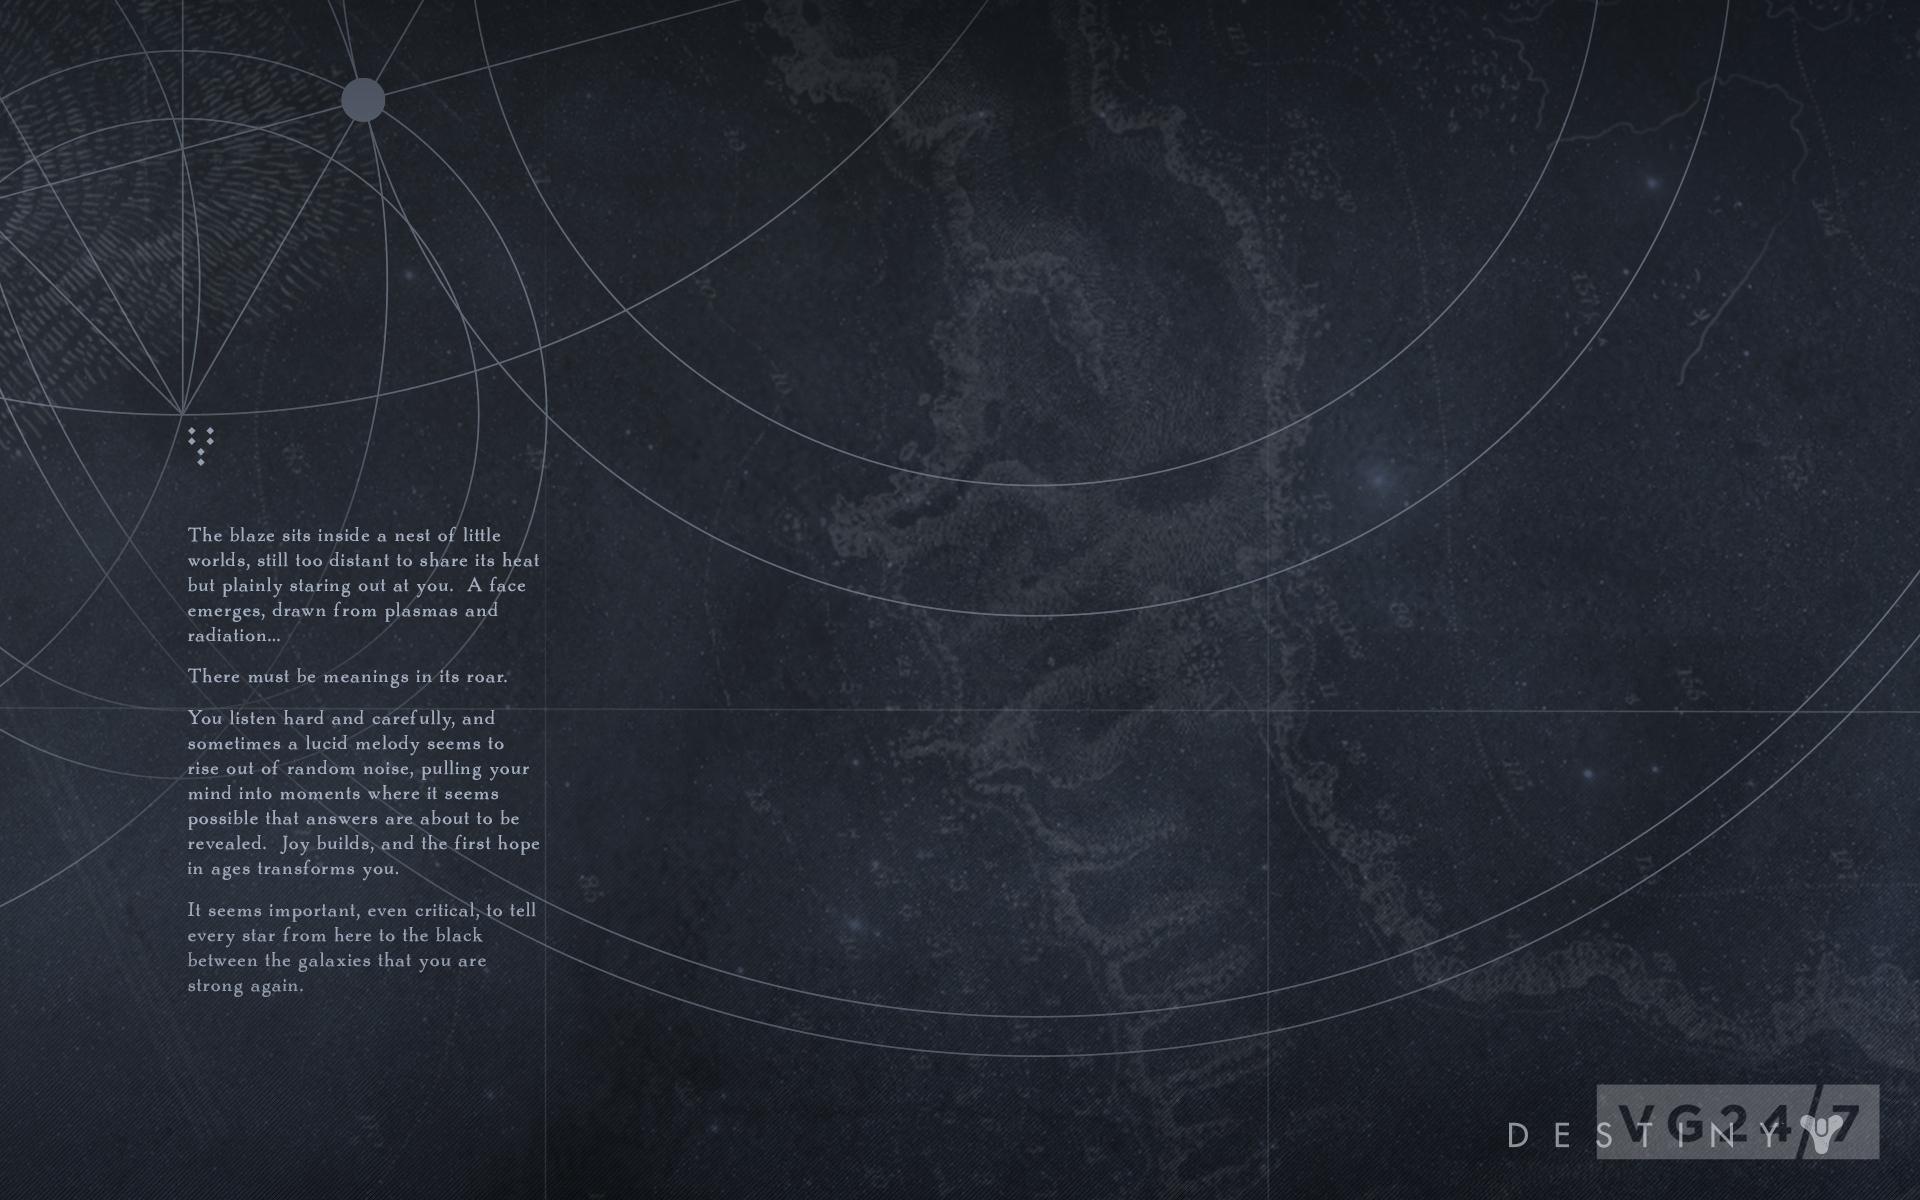 Drawn music destiny One game Destiny ARG wallpapers